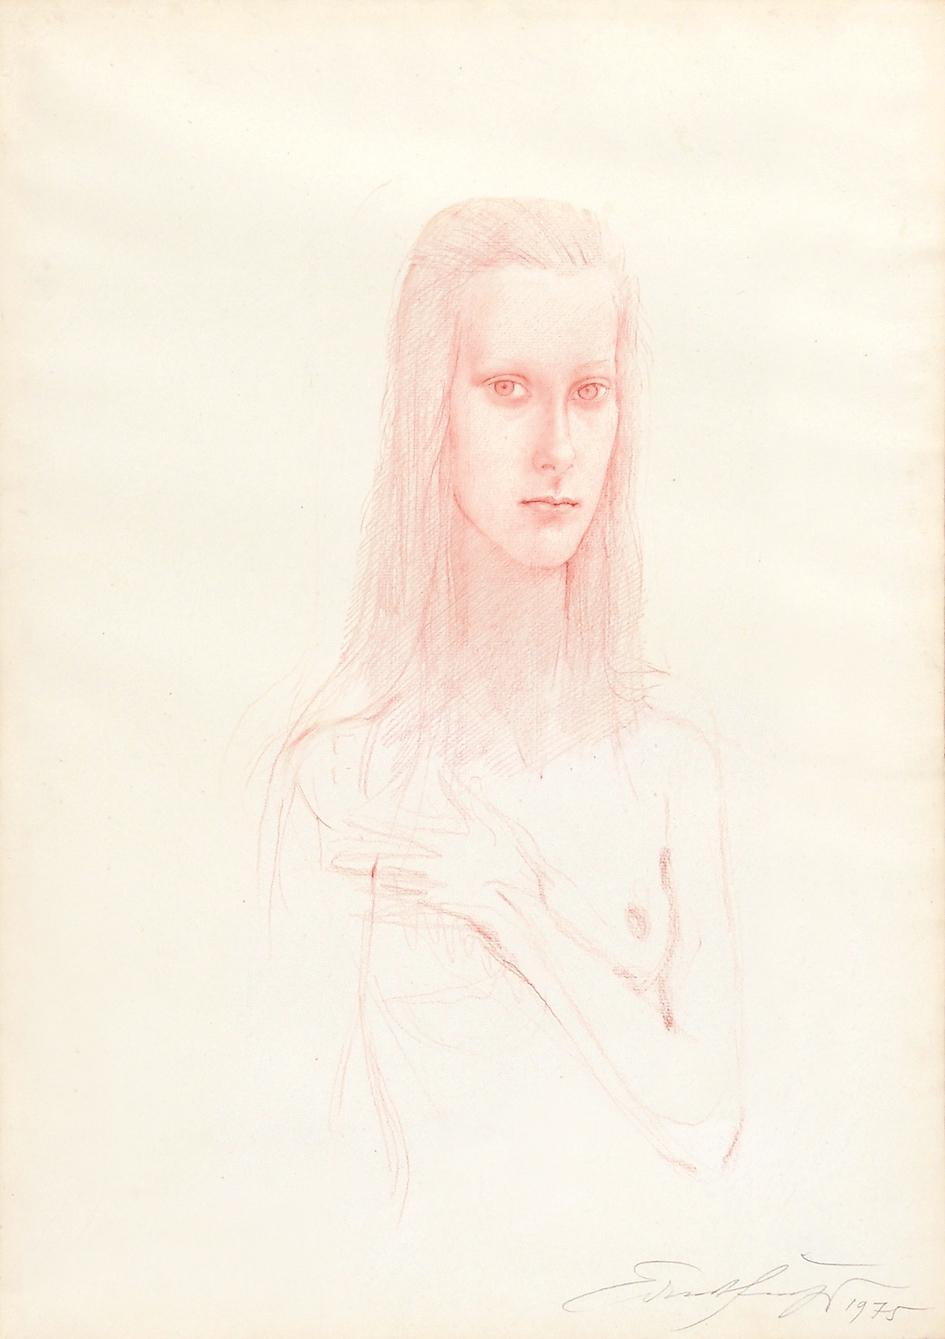 Fuchs Ernst, Portrait of a Girl